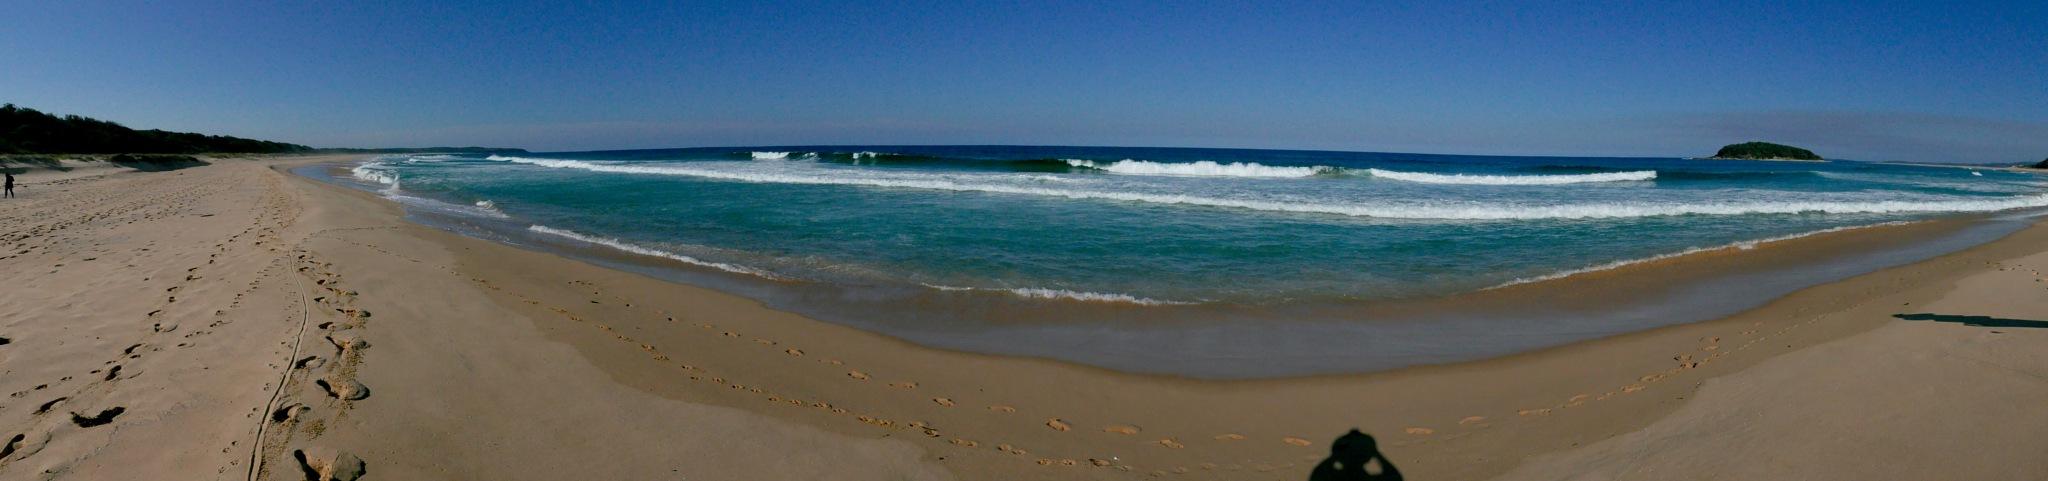 Narrawallee Beach NSW Australia by Graham Levi